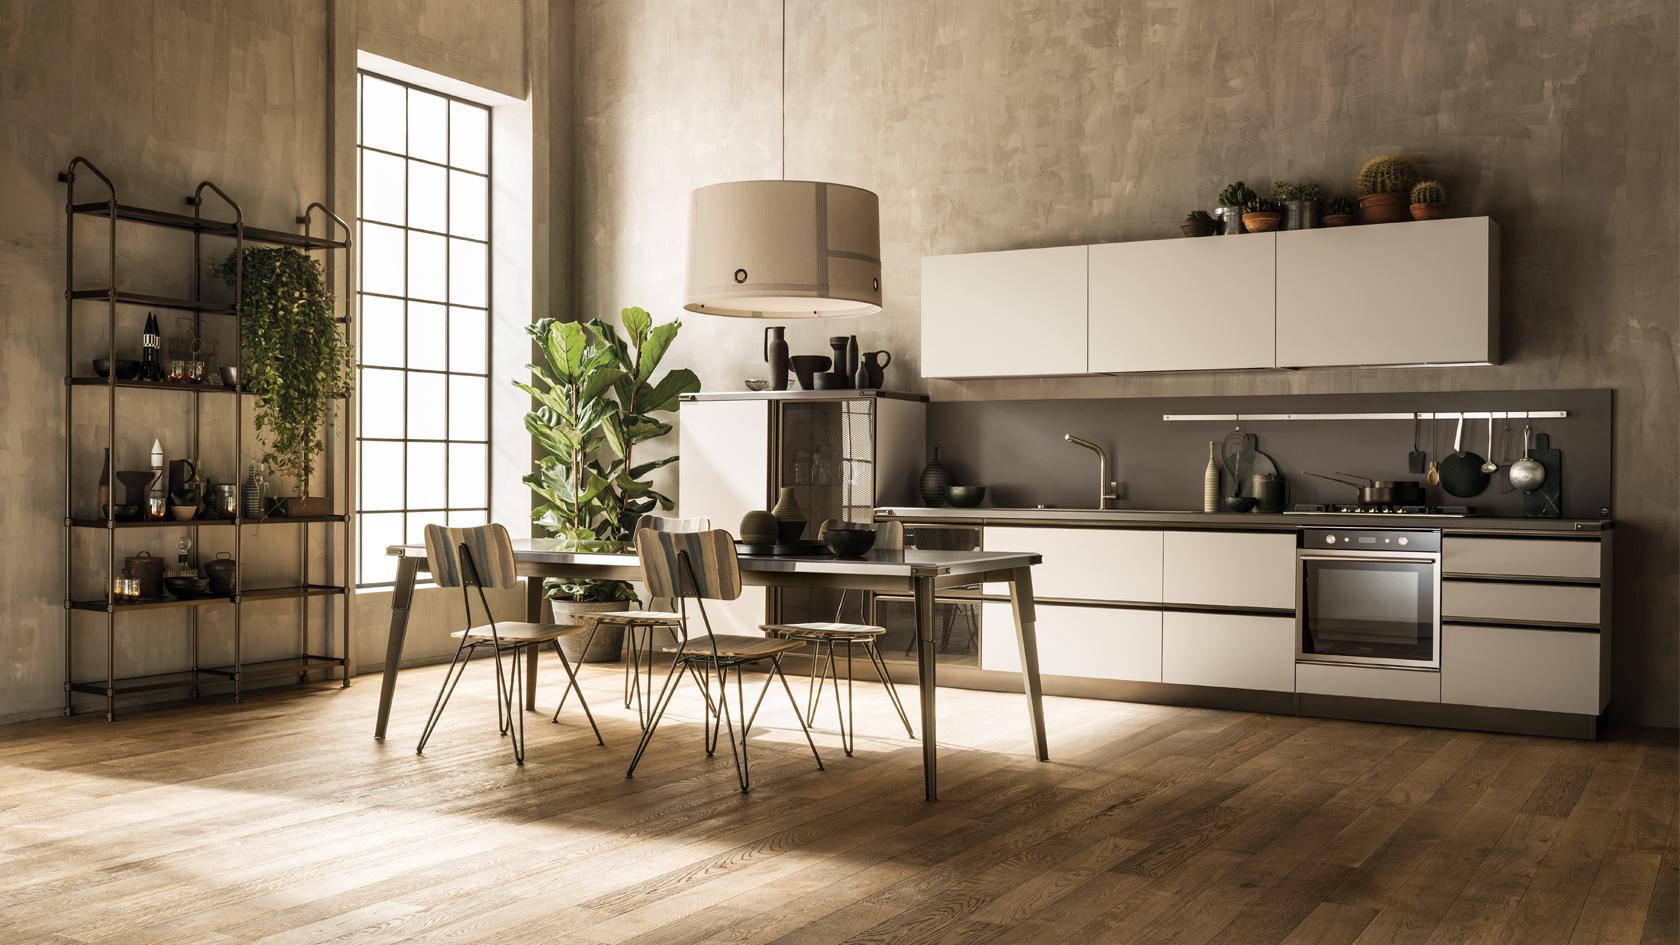 Cucina Moderna Scavolini Diesel Open Workshop-mobili incardone